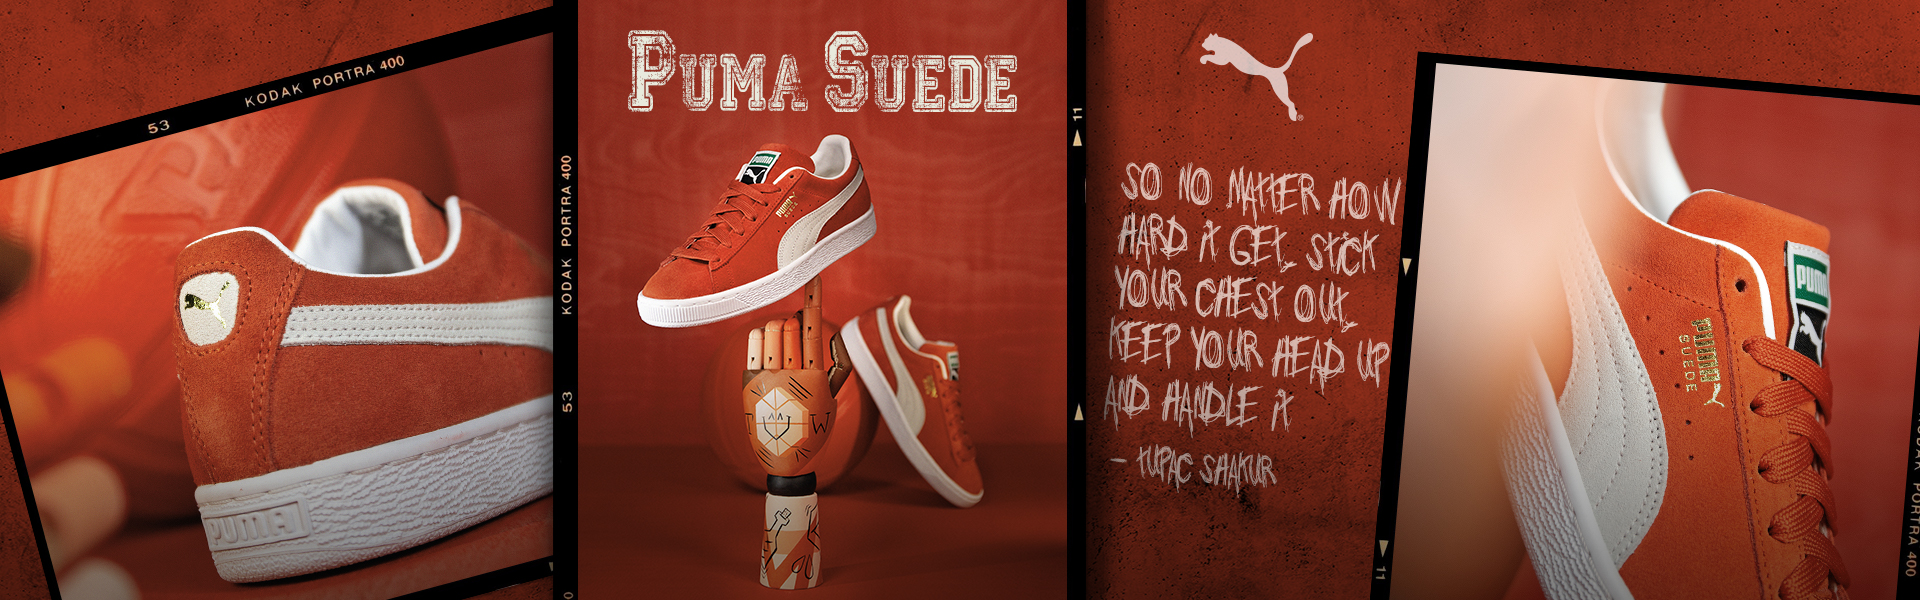 Puma Suede Red